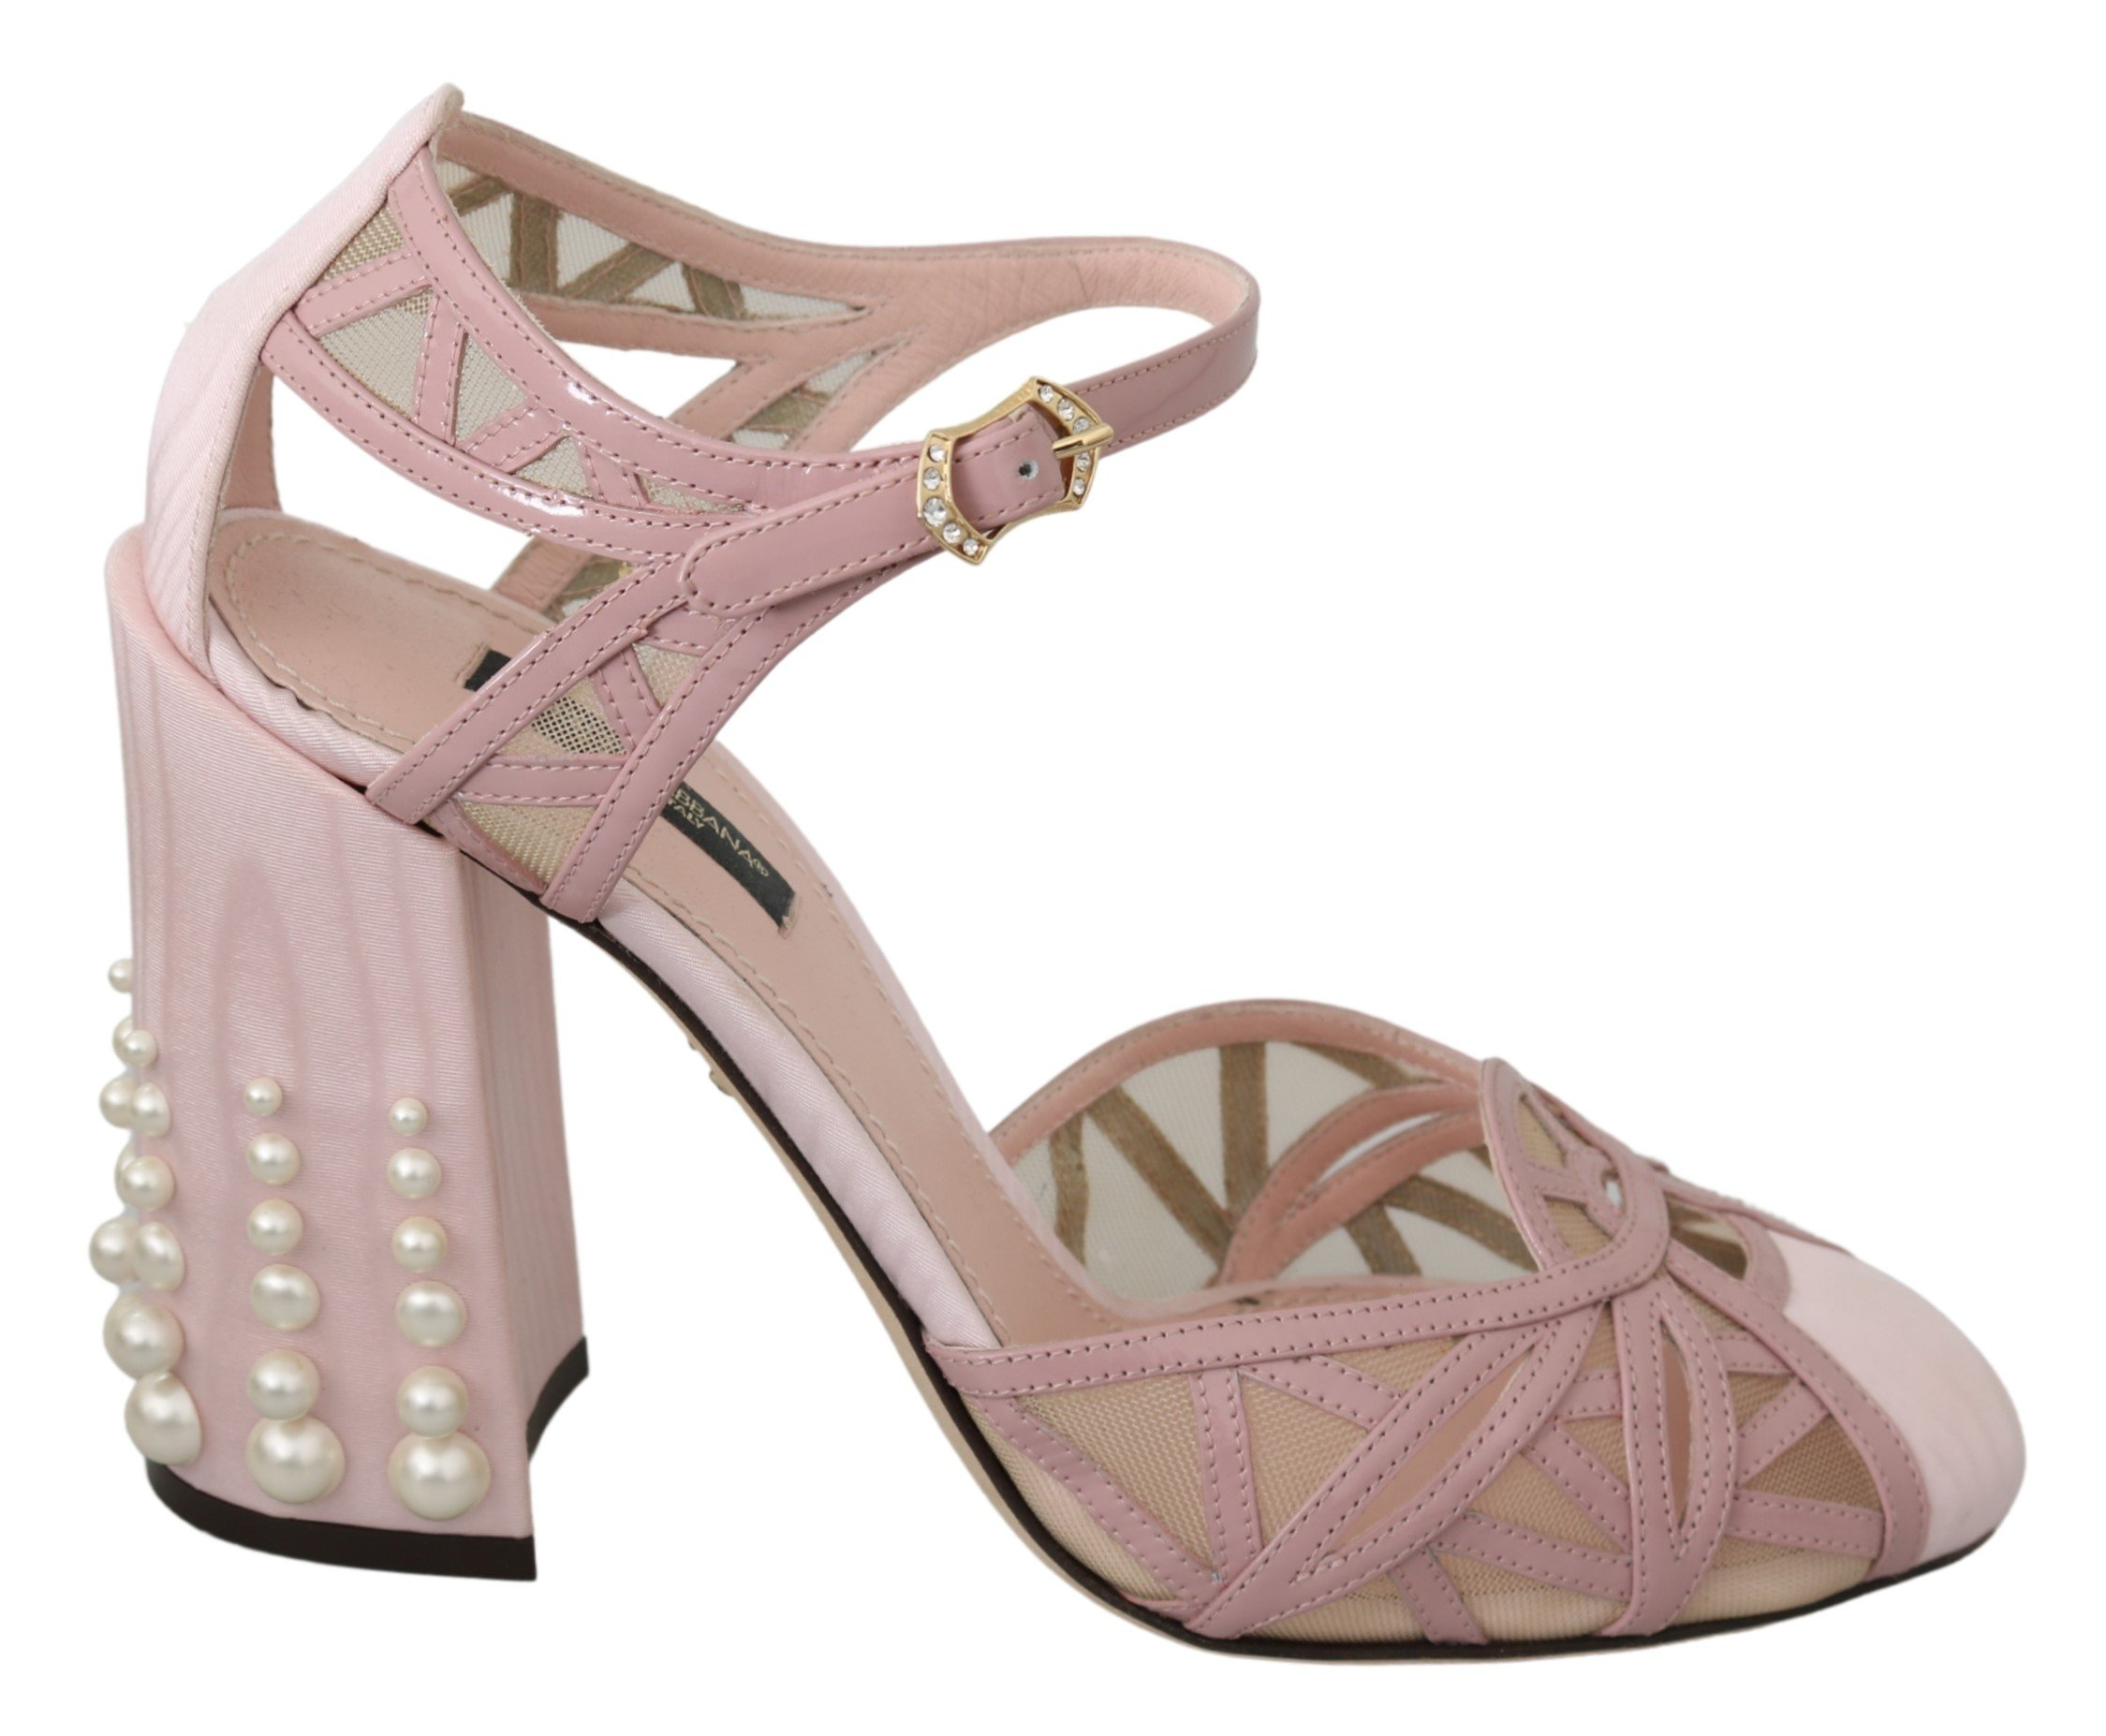 Dolce & Gabbana Women's Pearls Ankle Strap Leather Sandal Pink LA6907 - EU39/US8.5